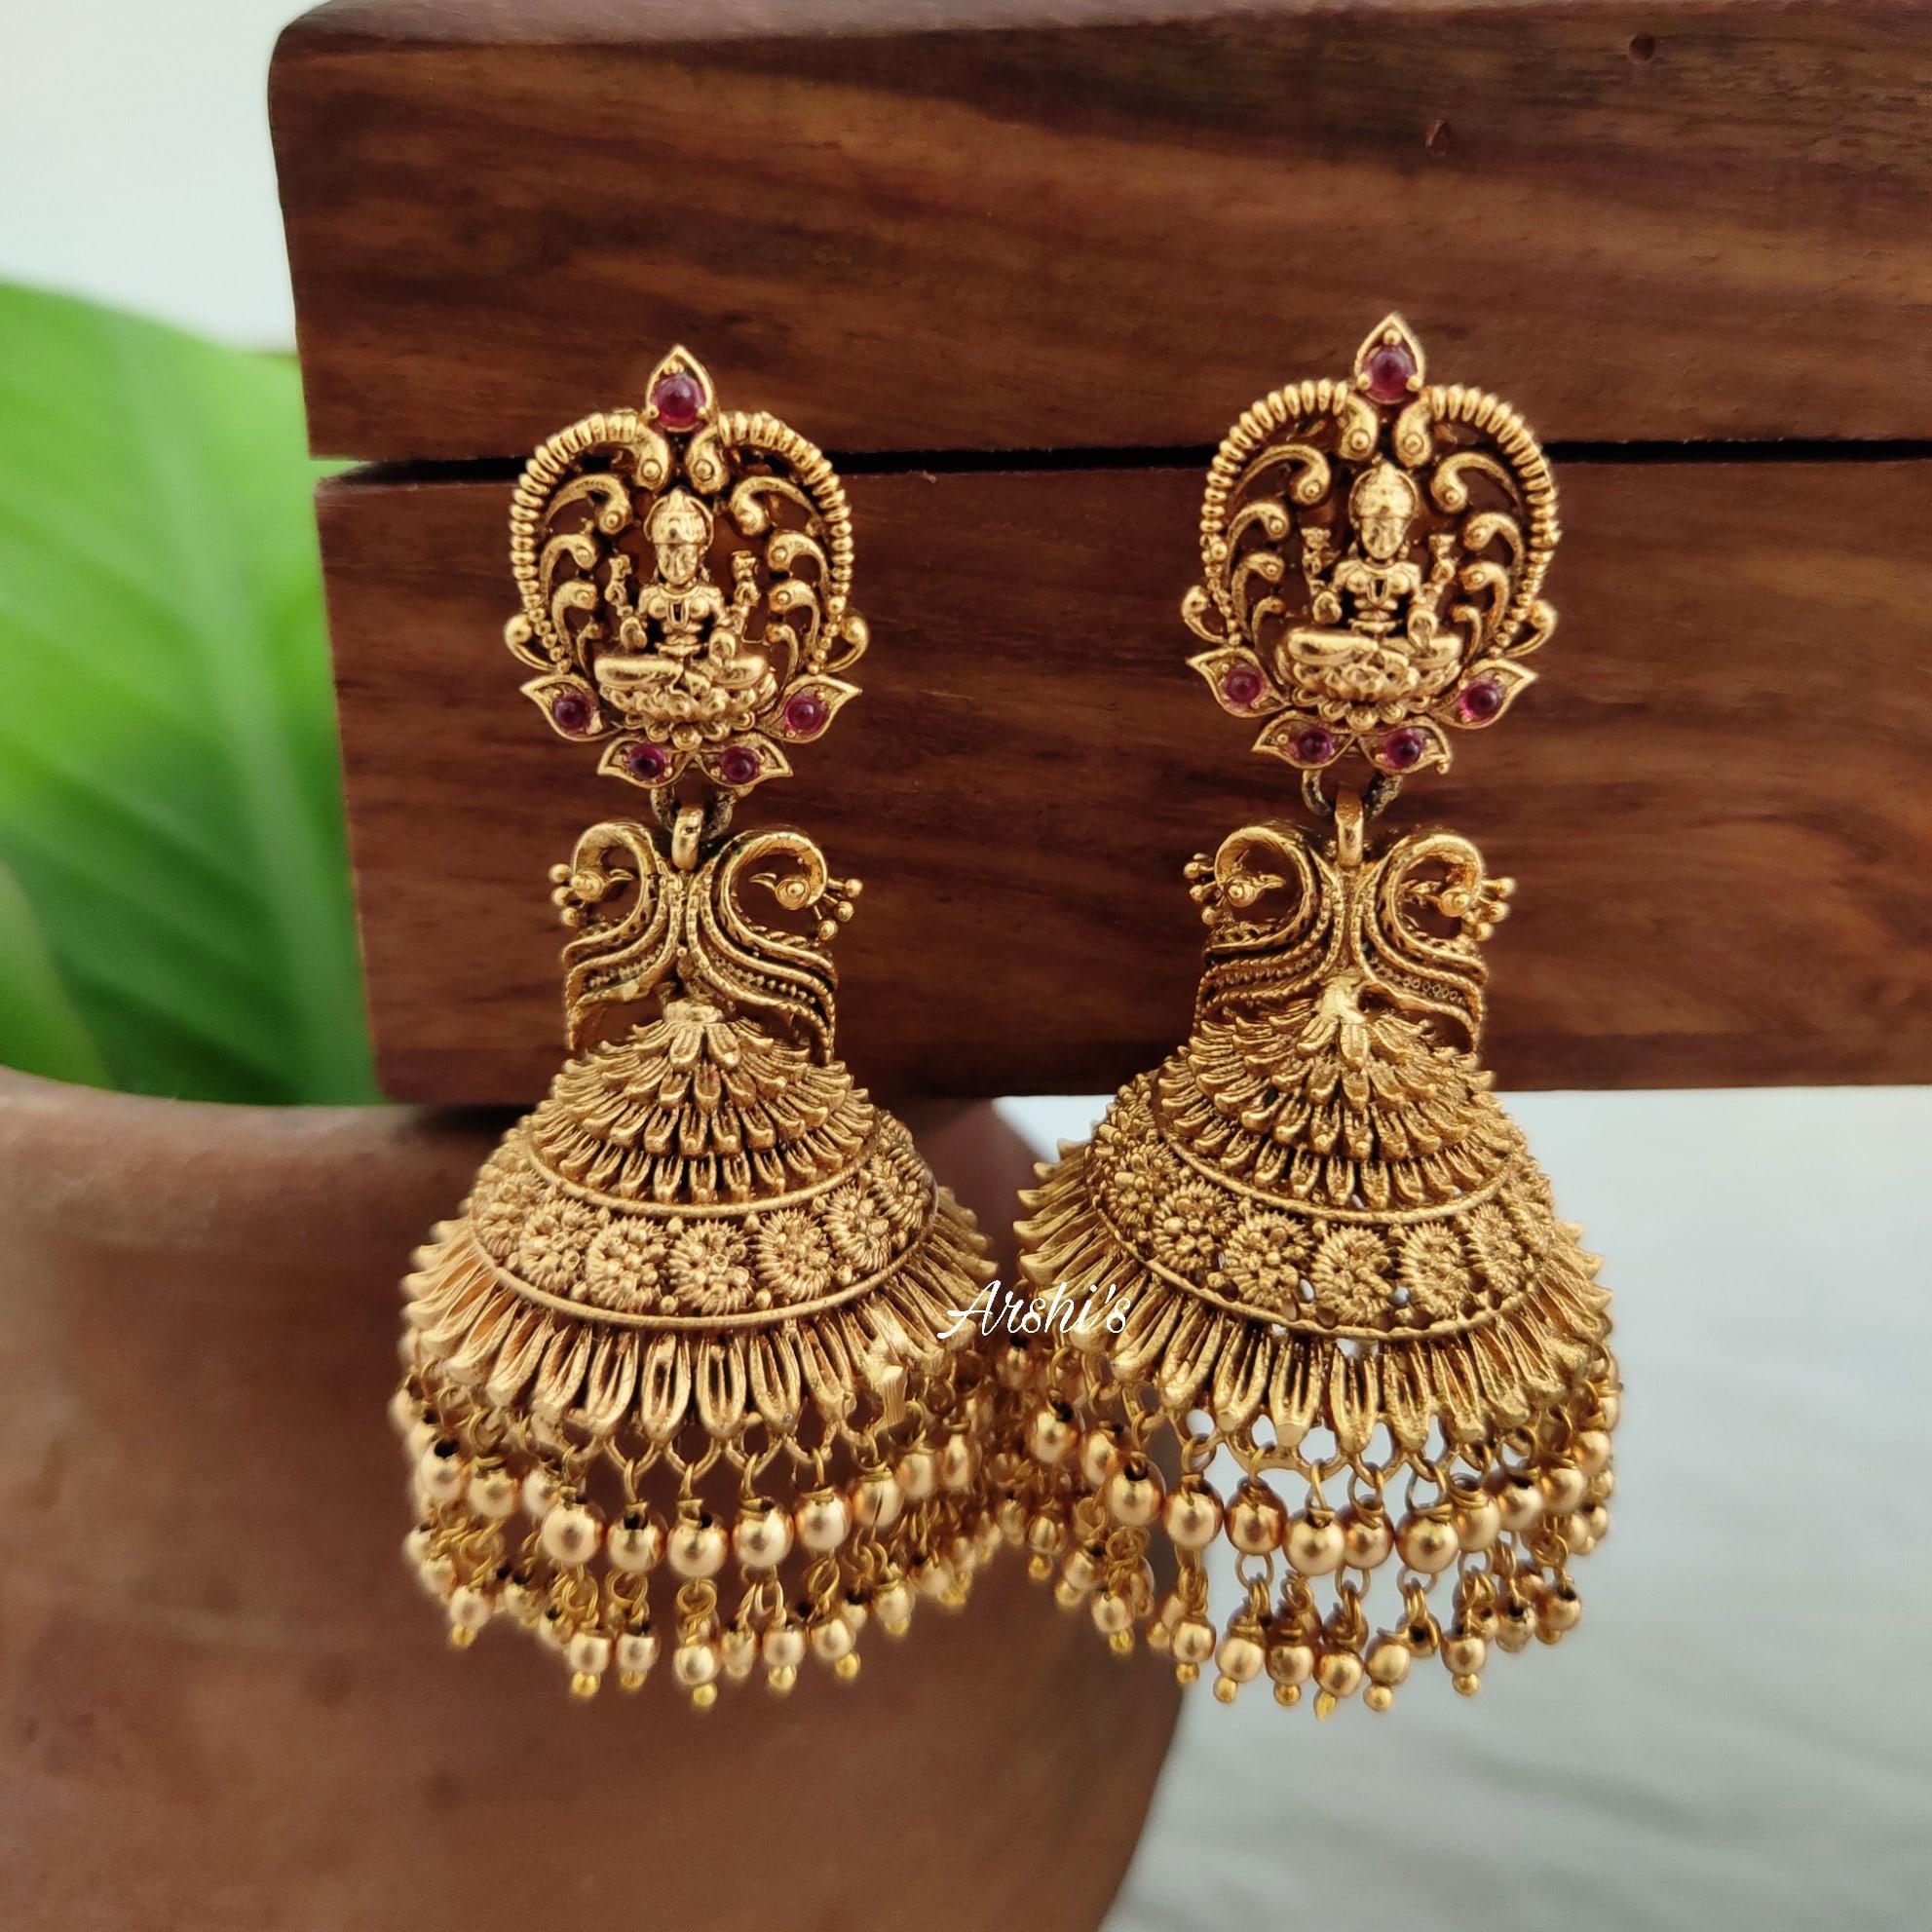 Imitation-Gold-Drops-Lakshmi-Jhumkas-01